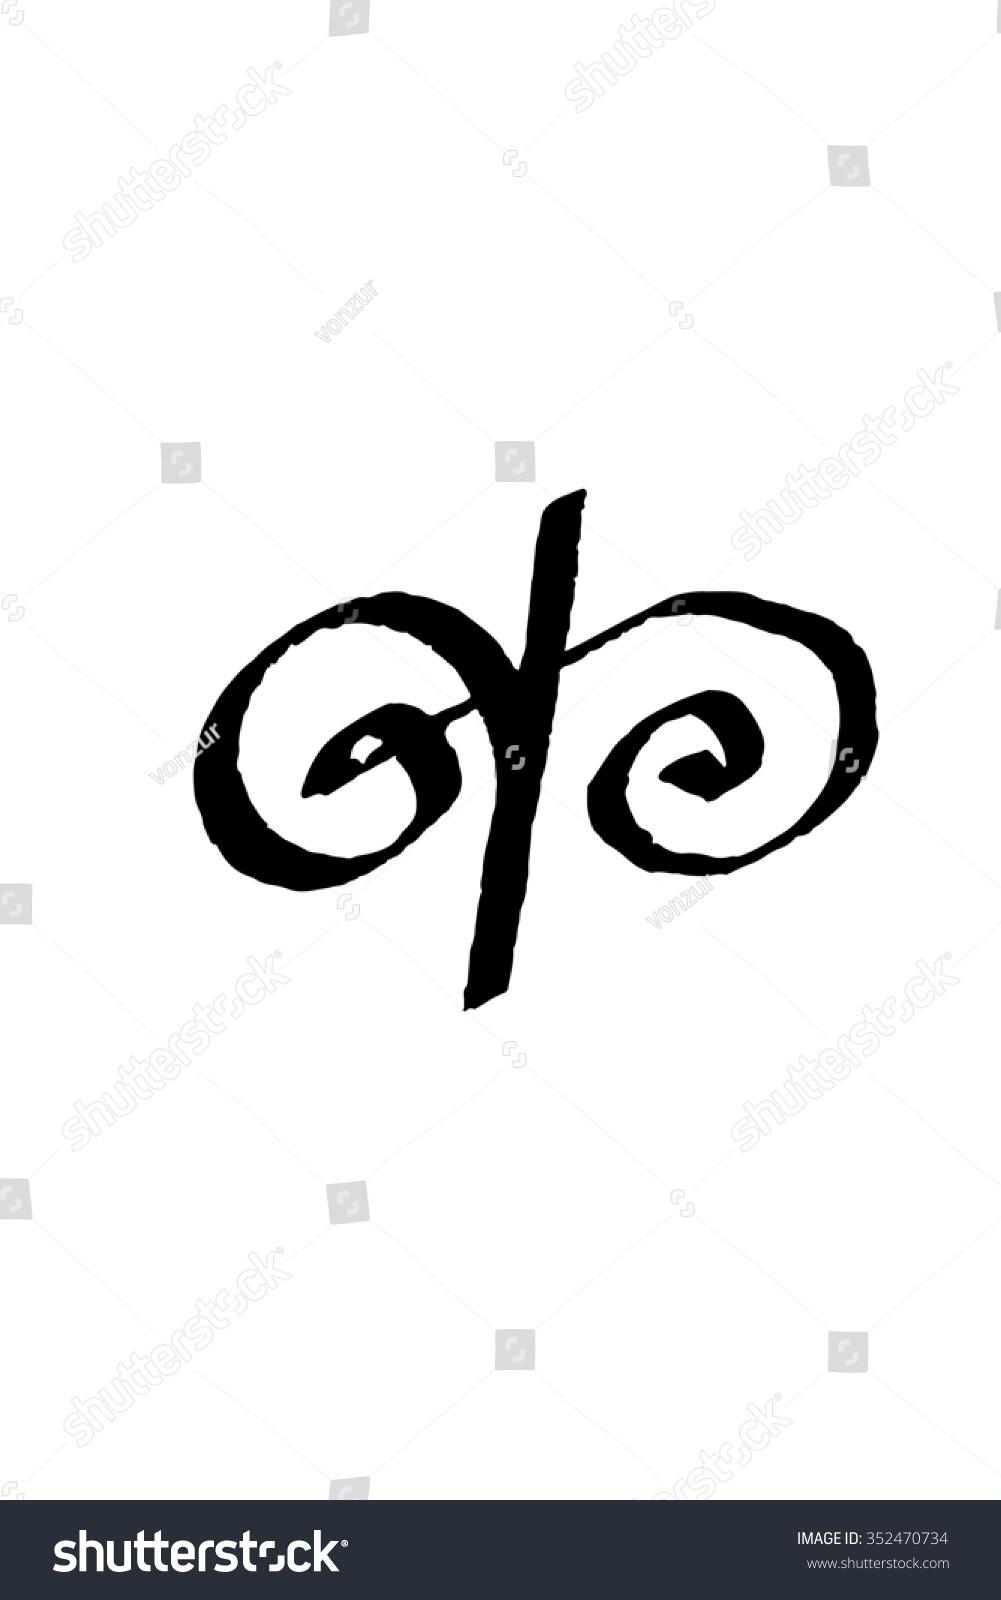 Zibu Angelic Symbols Used Connect Love Stock Vector 2018 352470734